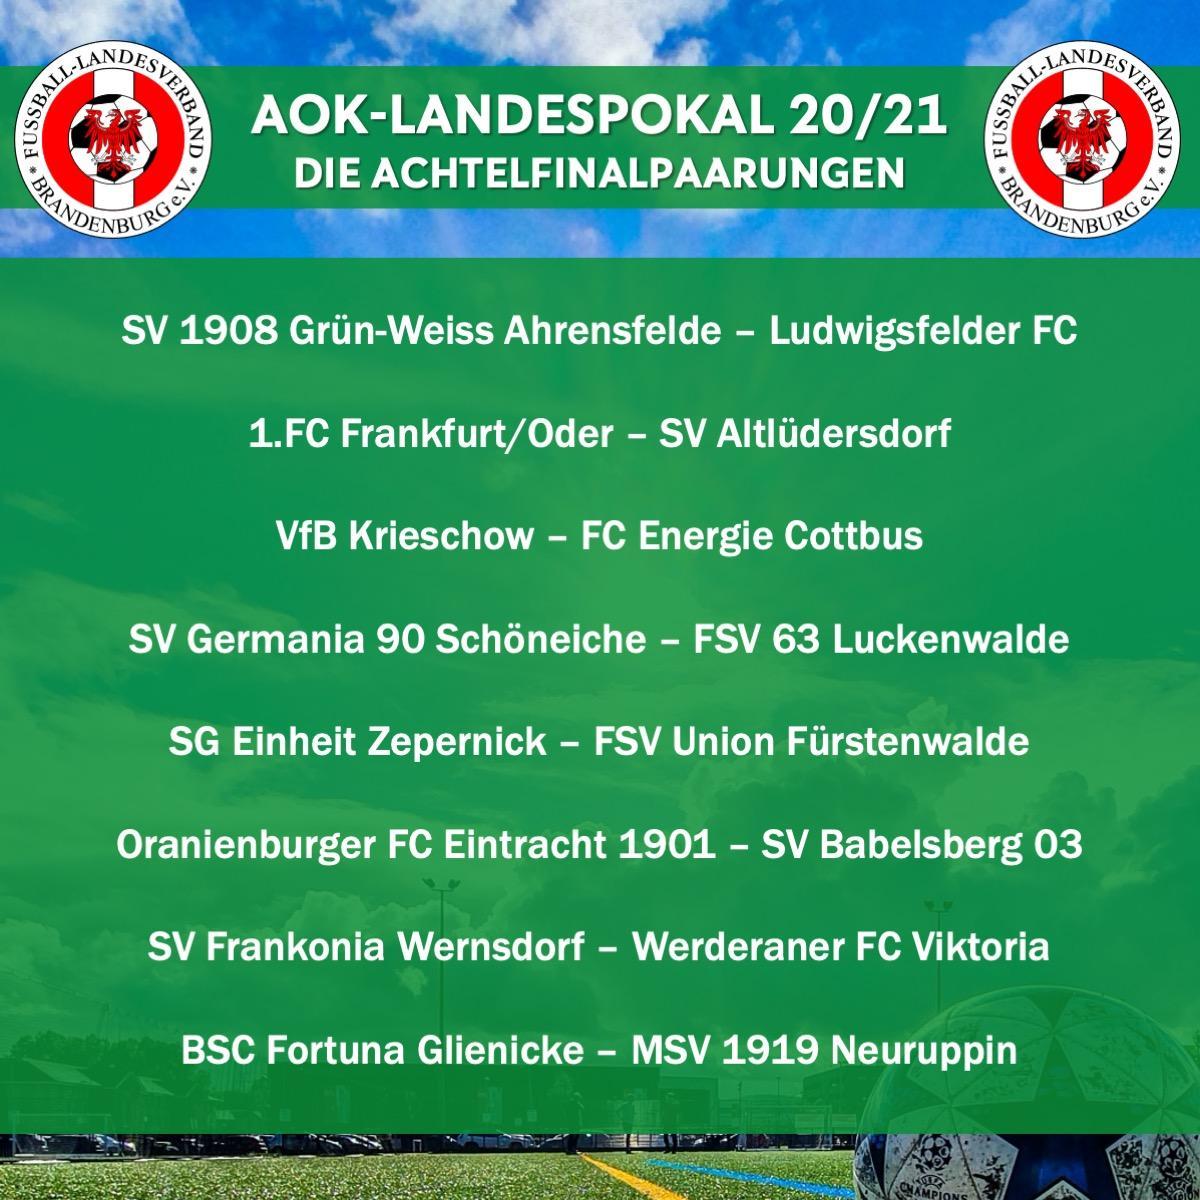 Achtelfinale Landespokal 2020_21